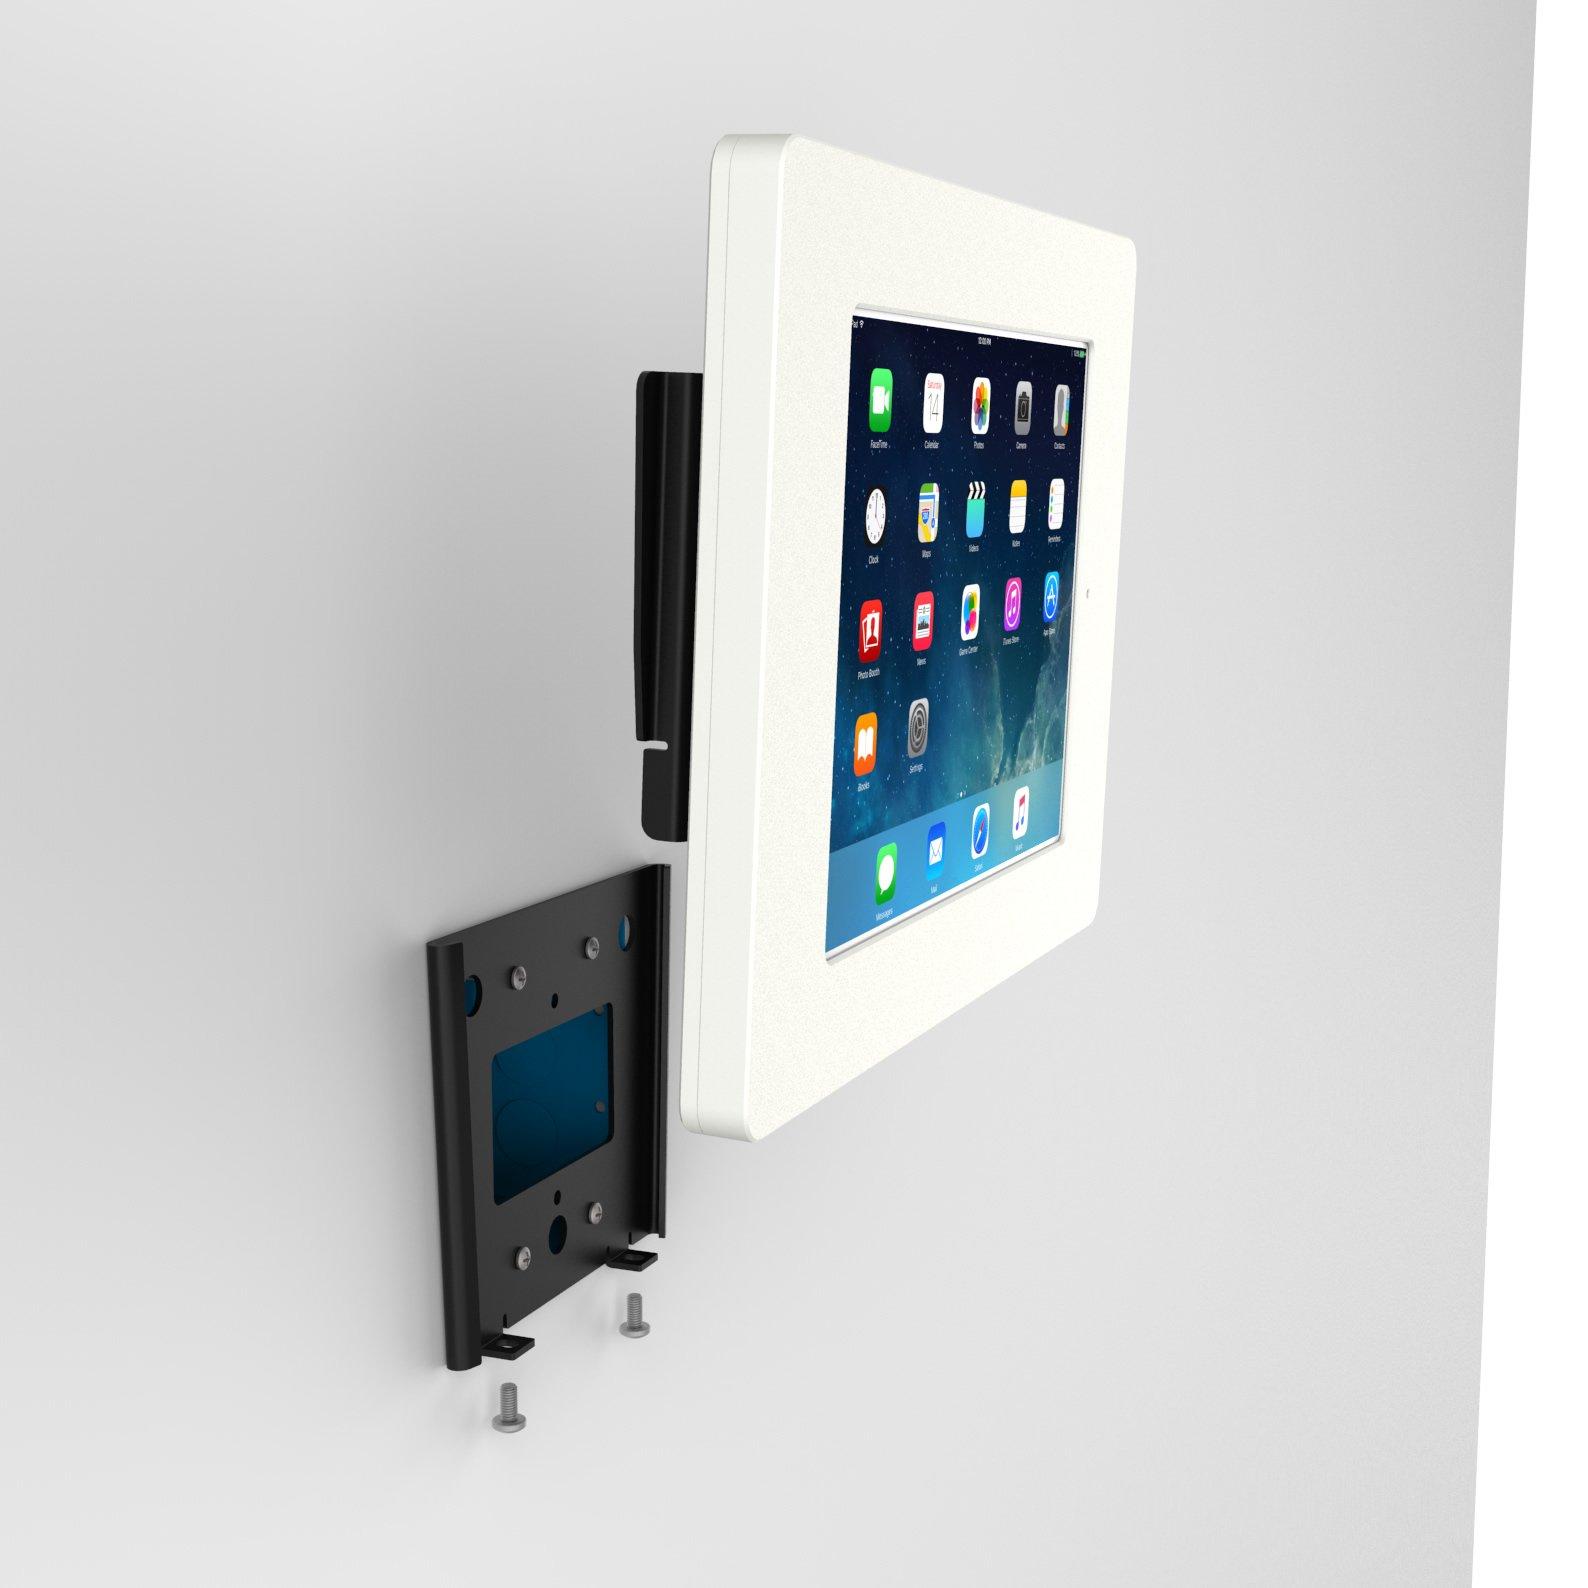 iPad (5th Gen) 9.7/Pro, Air 1/2 White Home Button Covered Fixed Slim VESA Wall Mount [Bundle] by VidaBox Kiosks (Image #9)